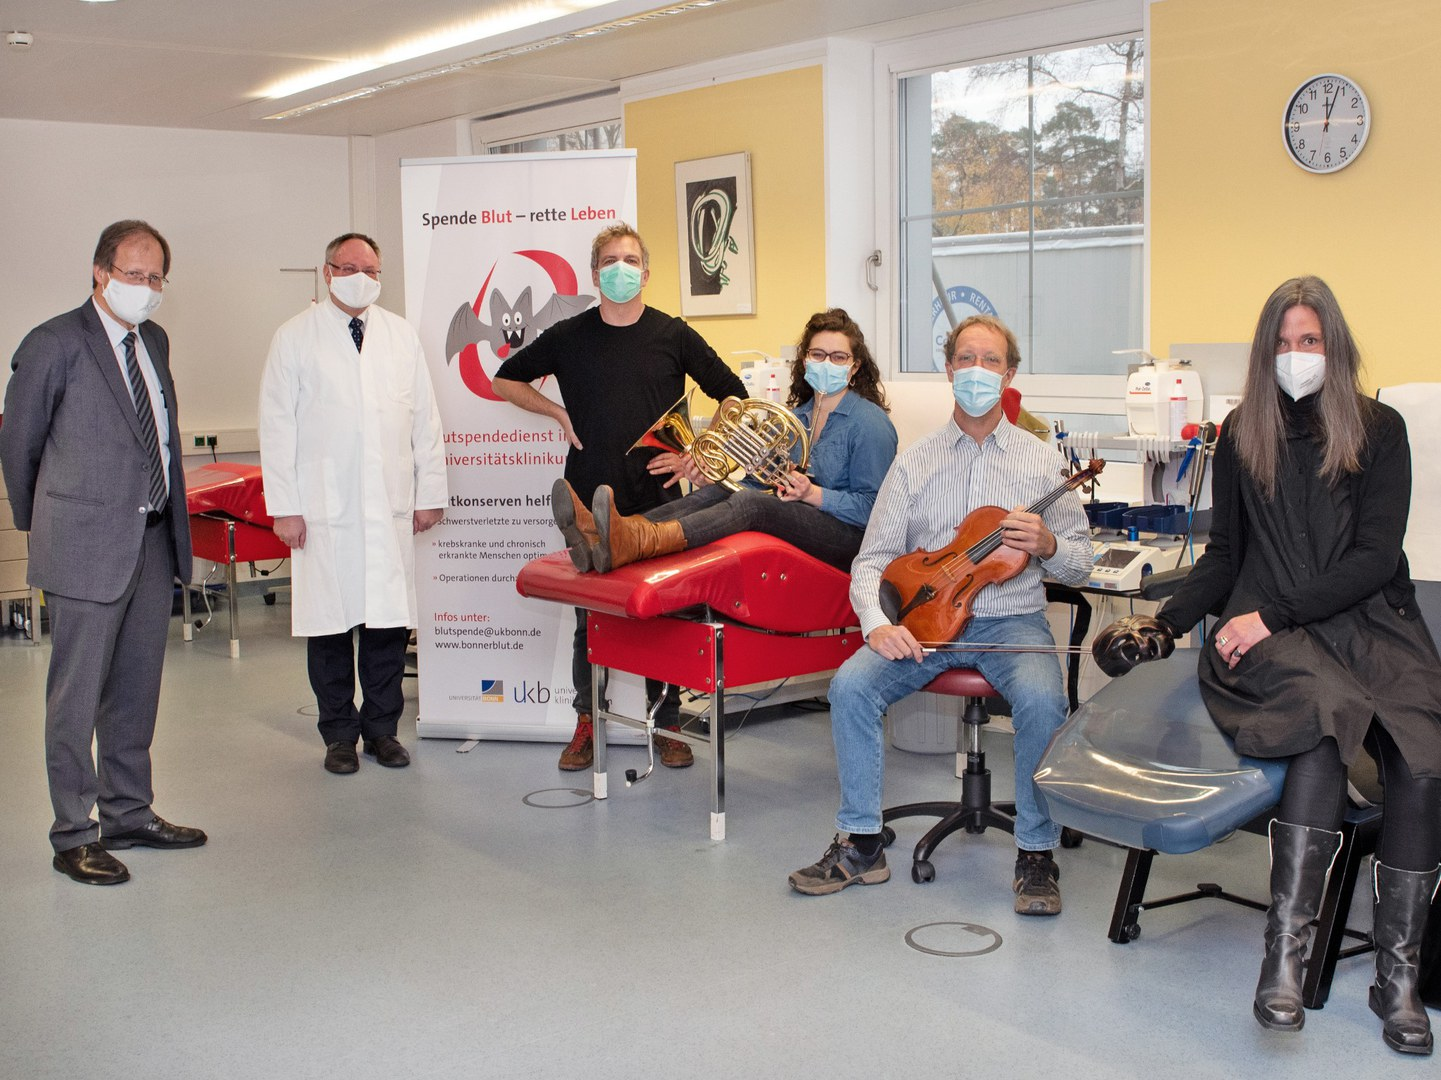 Musiker des Beethoven Orchester Bonn initiieren private Blutspende-Aktion am Universitätsklinikum Bonn zugunsten der freien Bonner Kulturszene: